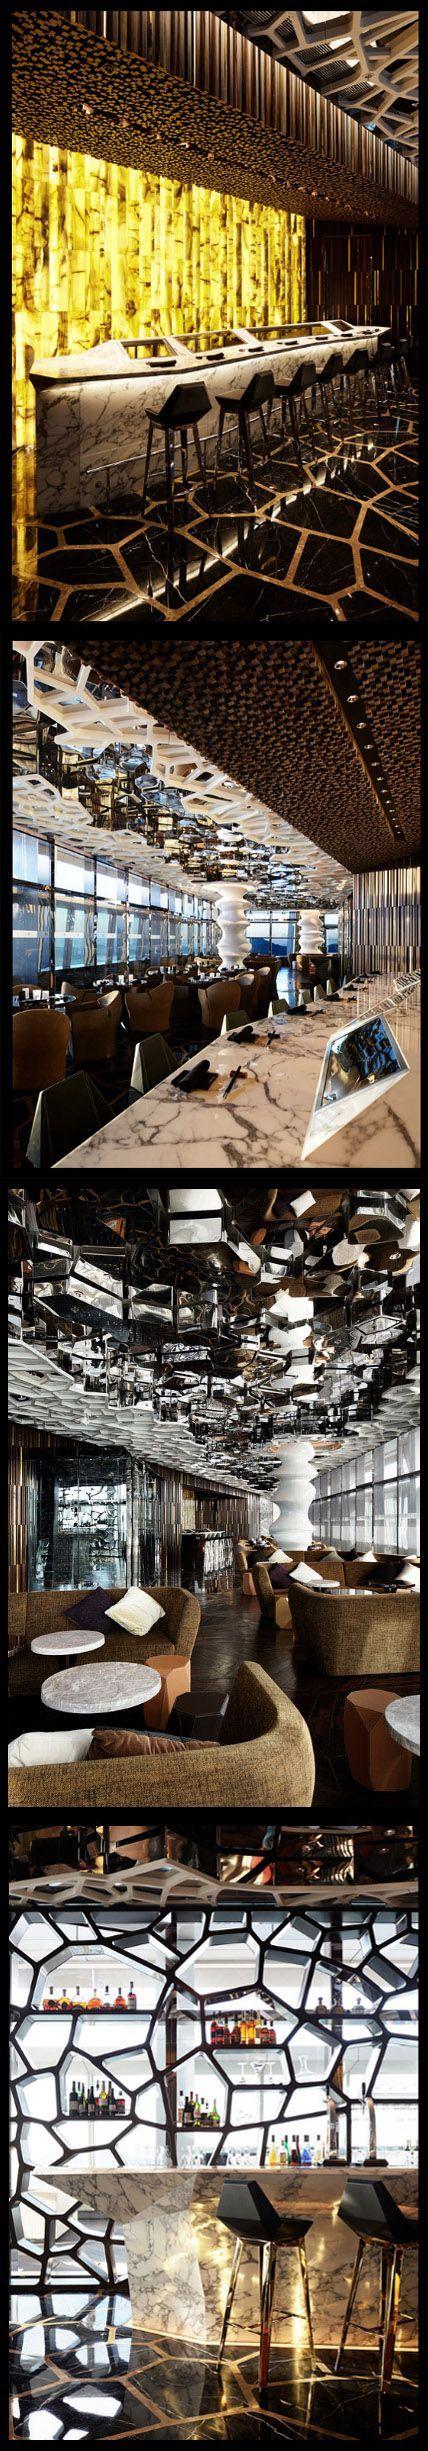 The Ozone Bar :: Wonderwall Kowloon. The Ritz-Carlton, Hong Kong